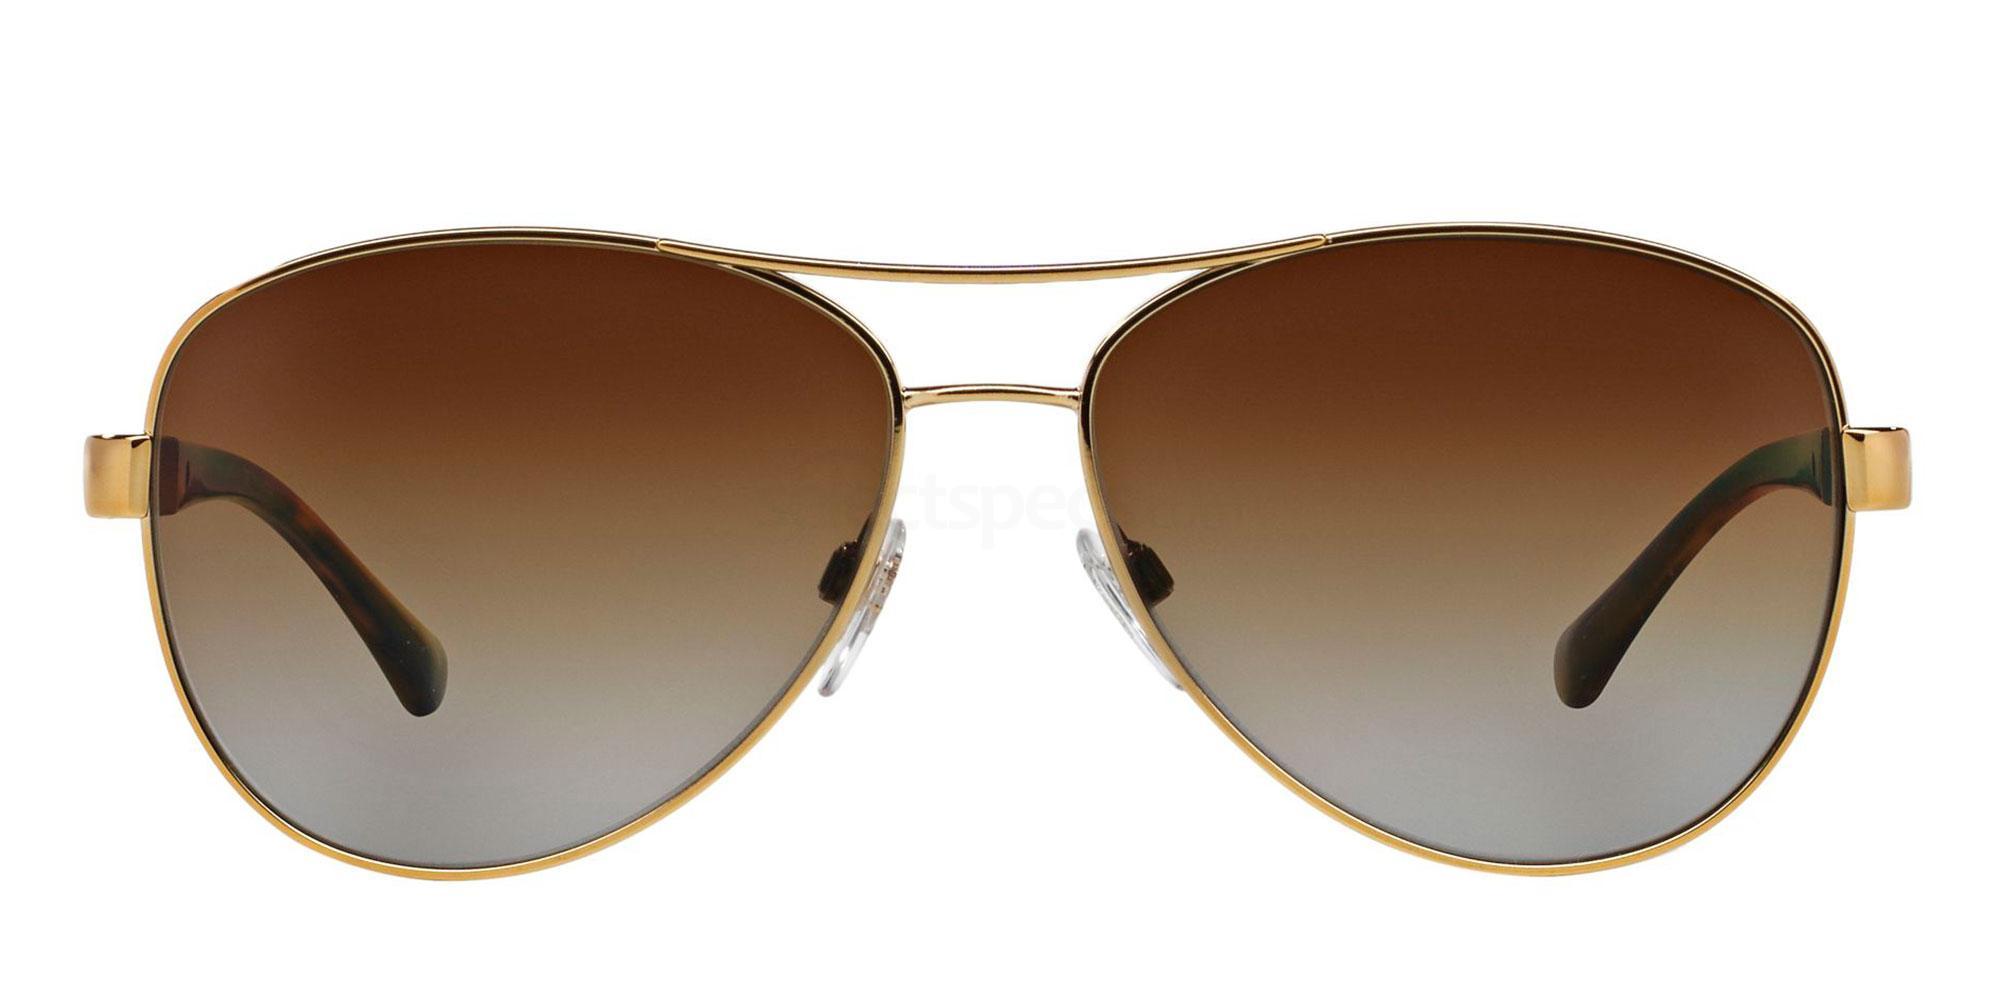 1145T5 BE3080 Sunglasses, Burberry